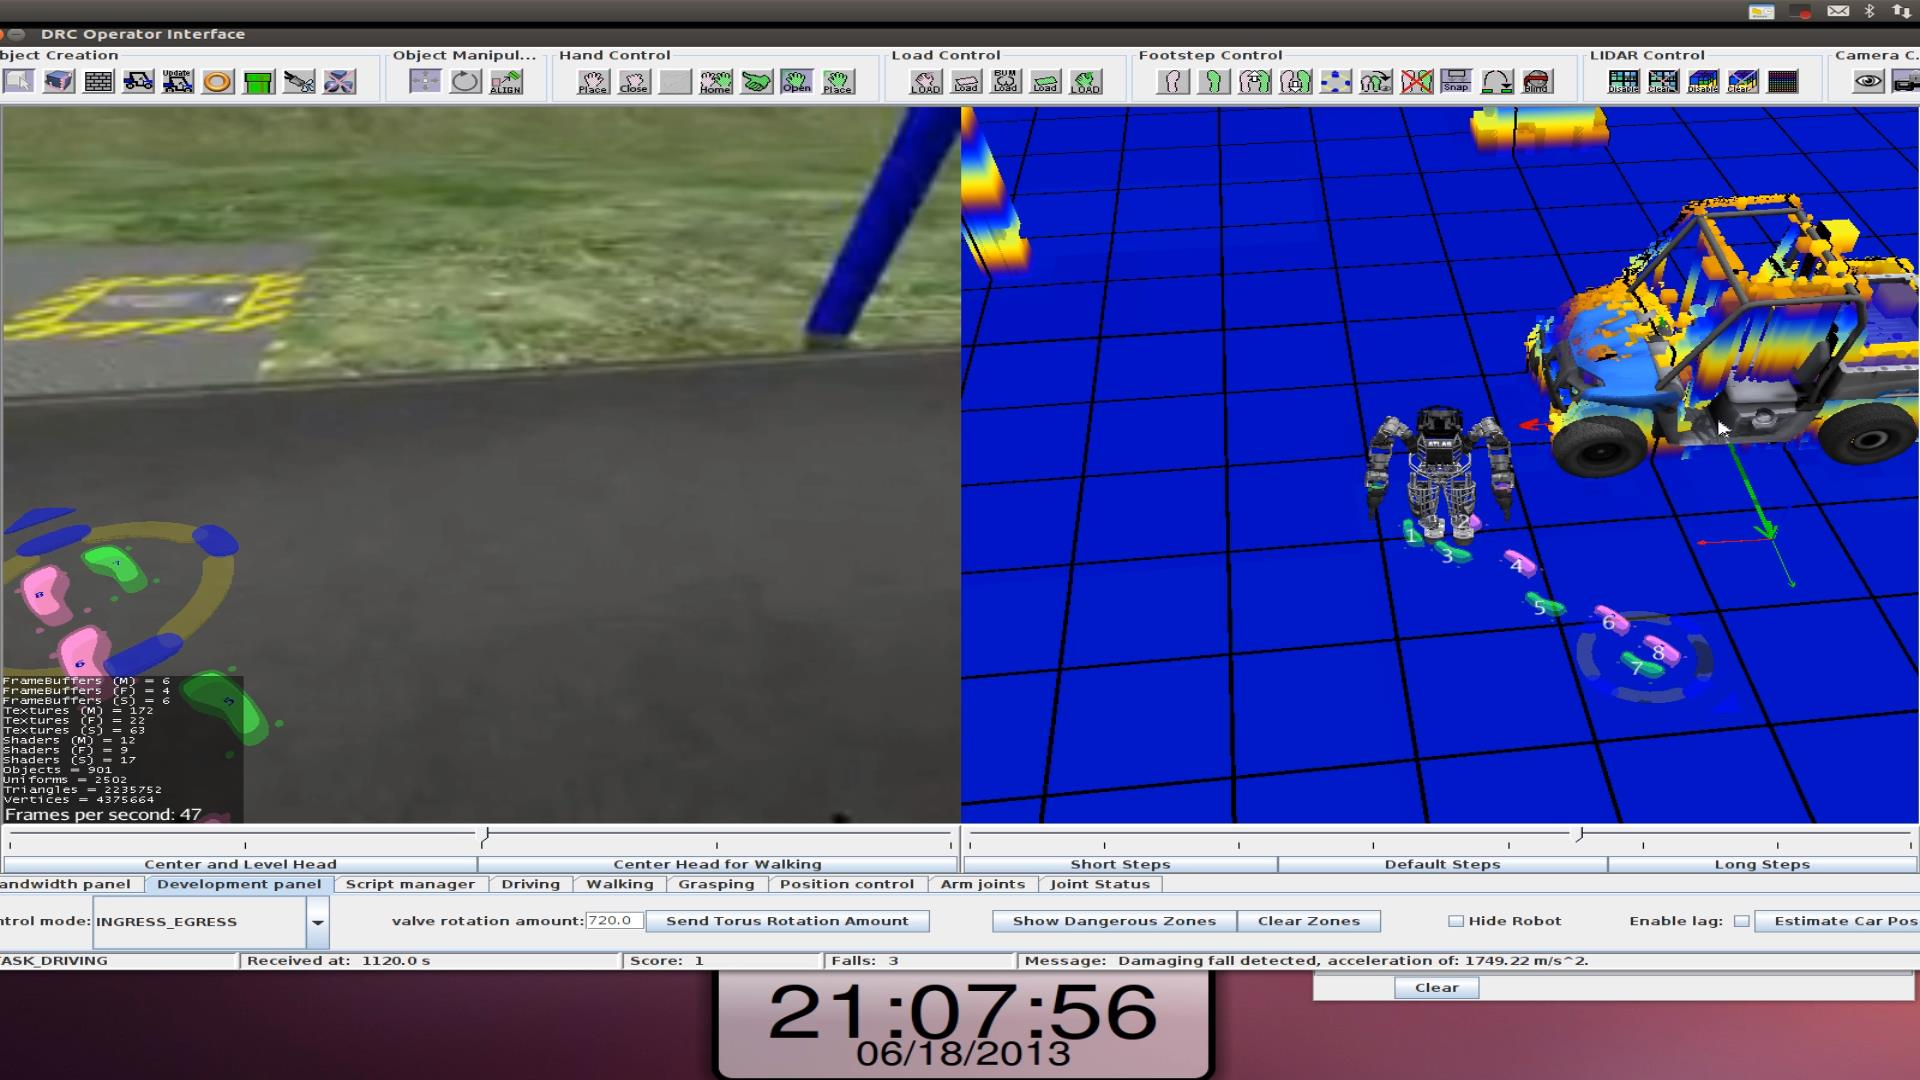 vrc_final_run1_driving (Subclip13).jpg